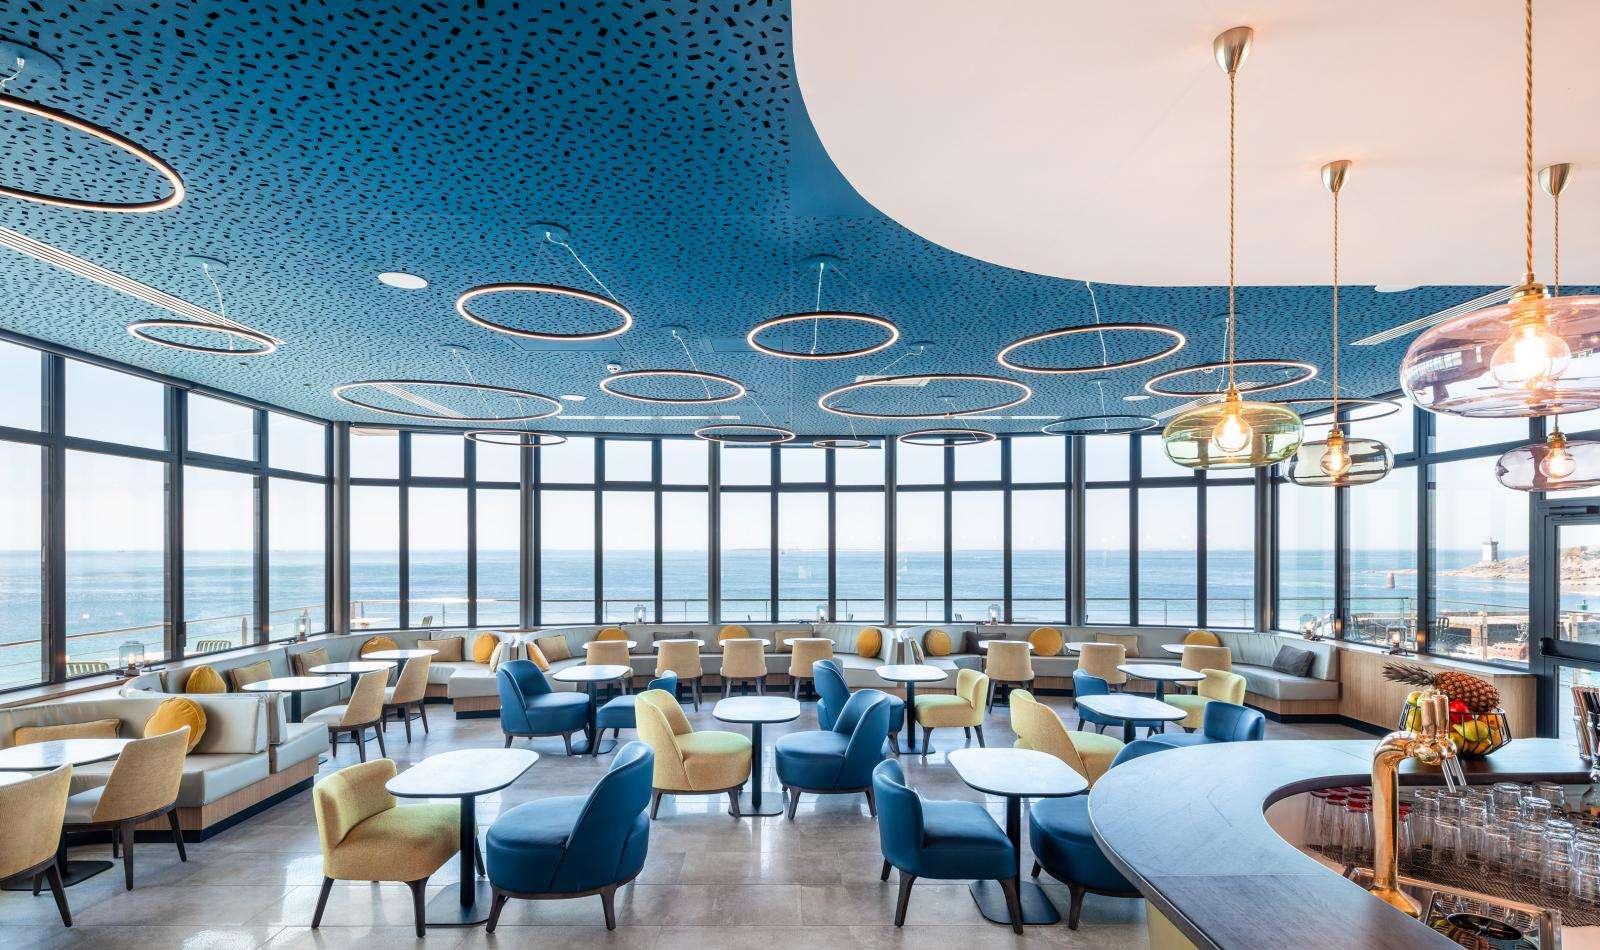 hotel-sainte-barbe-restaurant-2.jpg